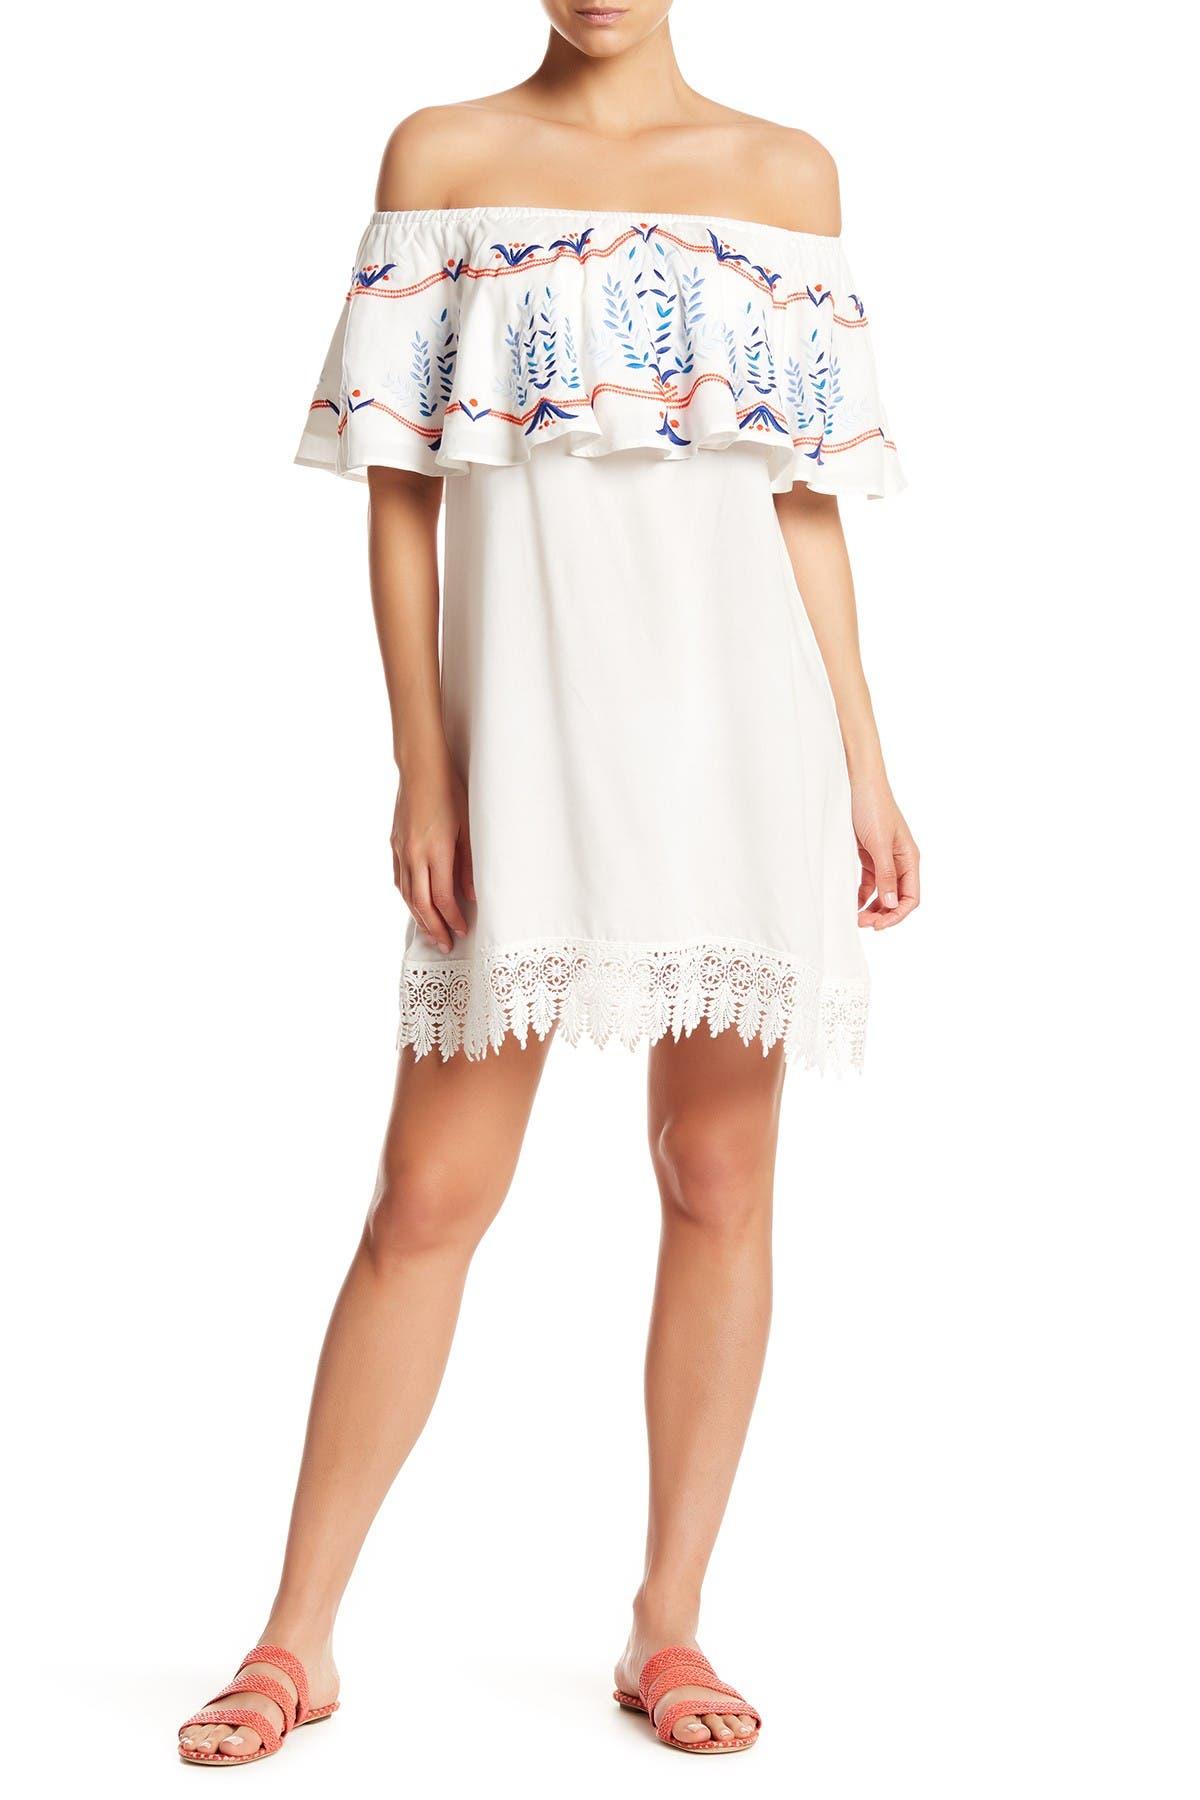 Image of Saha Swimwear Tol Short Dress